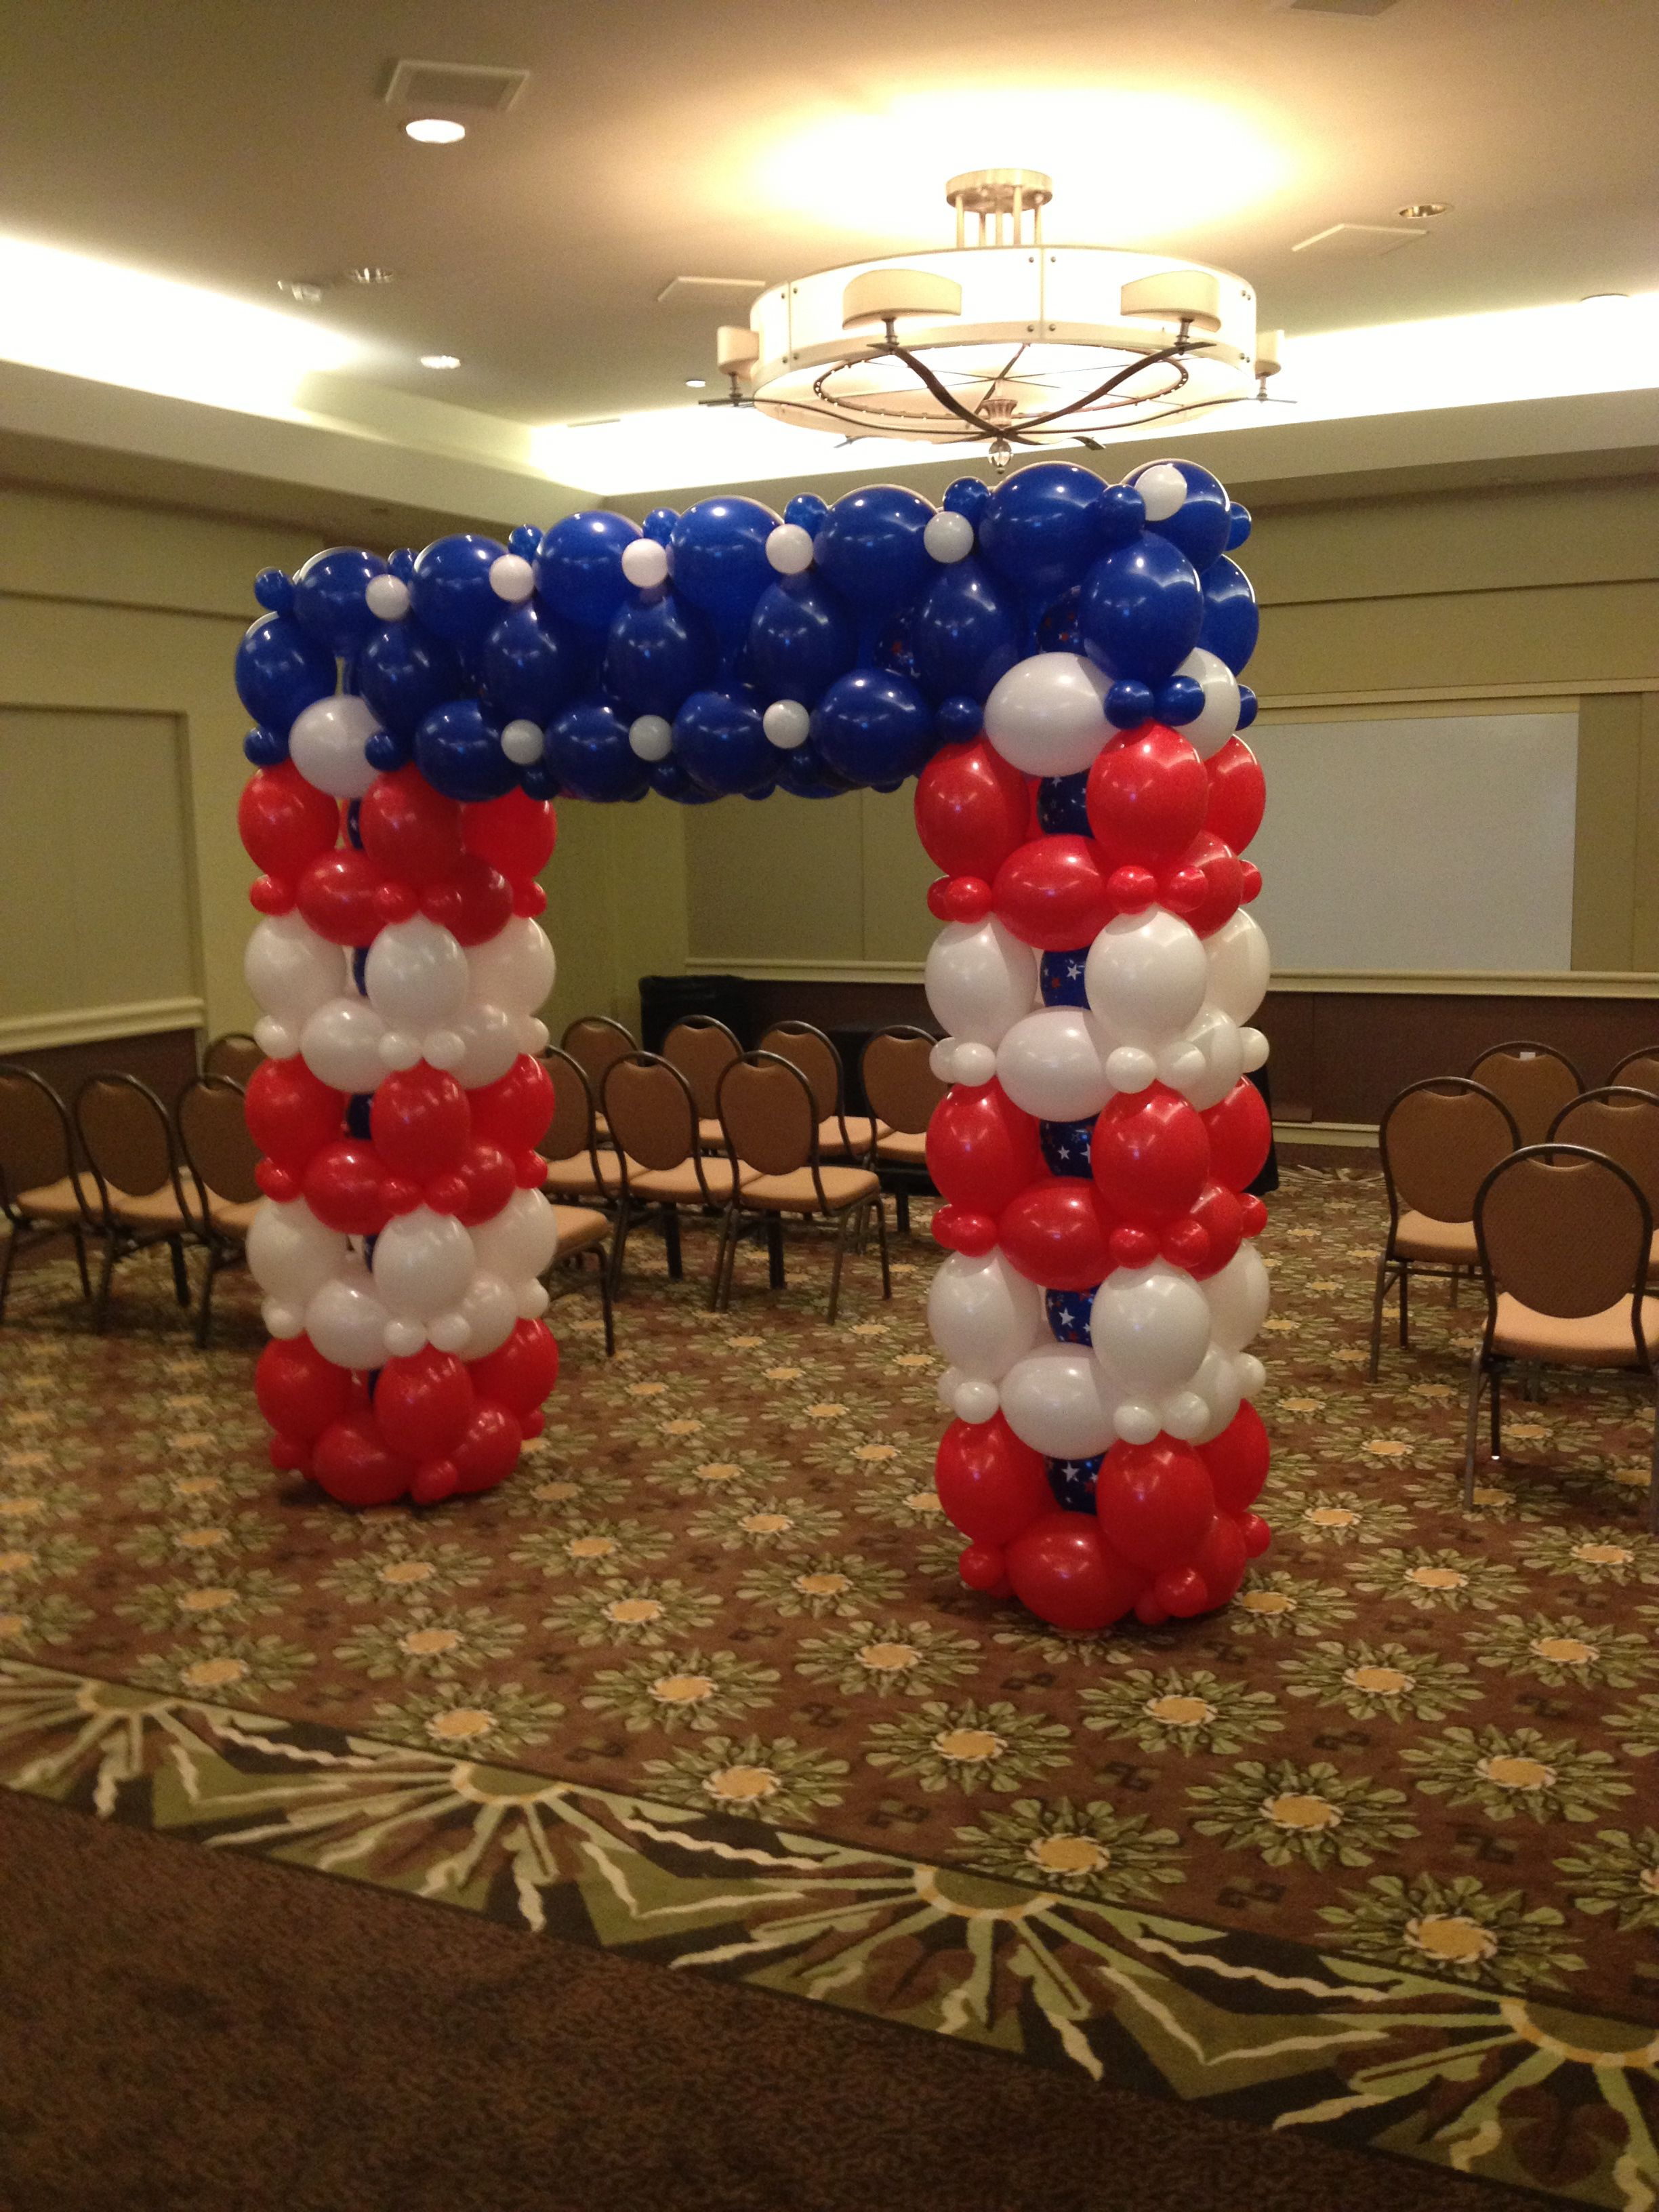 Wedding decoration ideas balloons  Patriot square balloon arch  Balloons  Patriotic  Pinterest